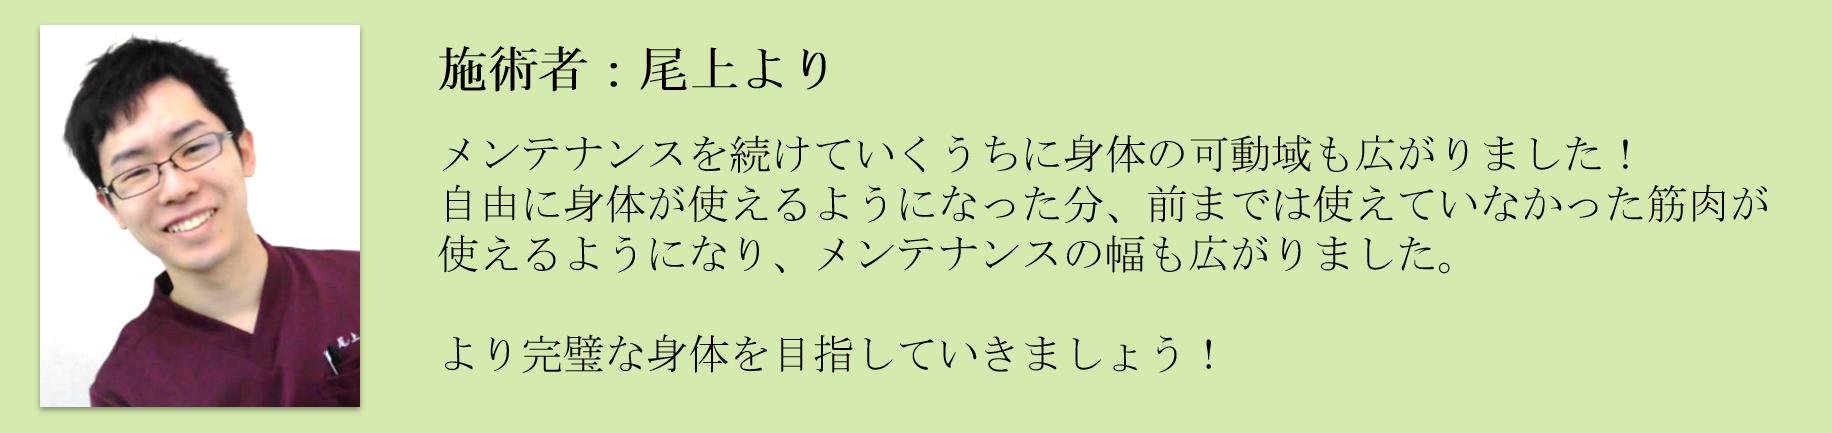 ogami_hitokoto-_teduka